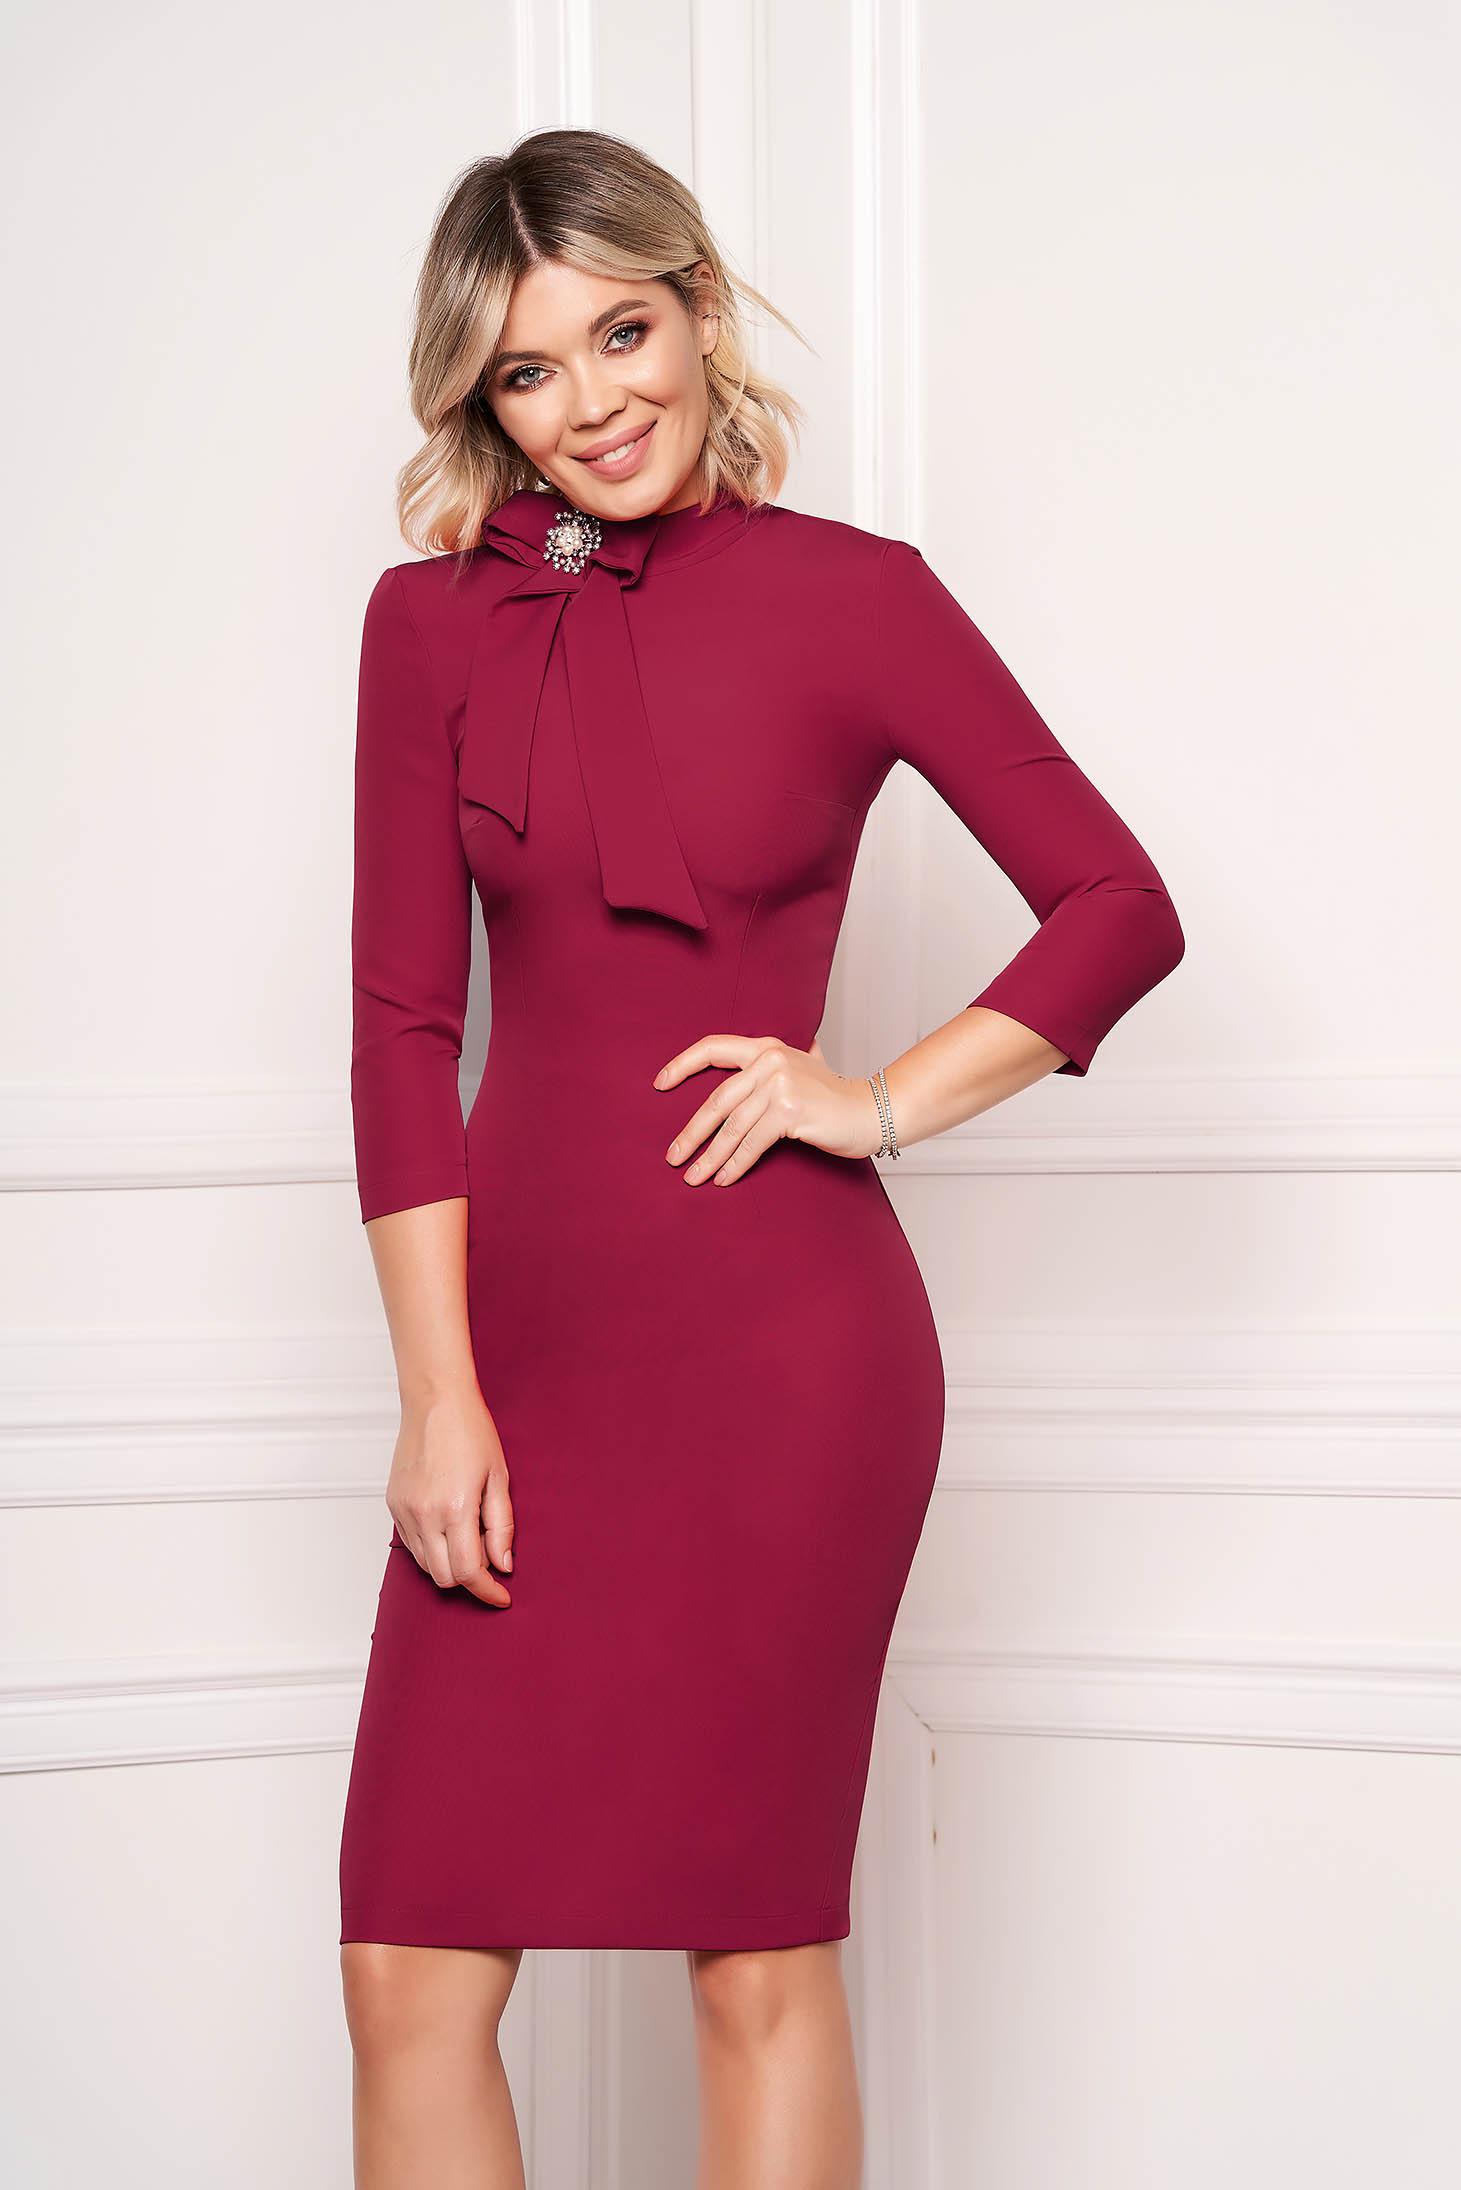 StarShinerS raspberry dress elegant office midi cloth slightly elastic fabric accessorized with breastpin